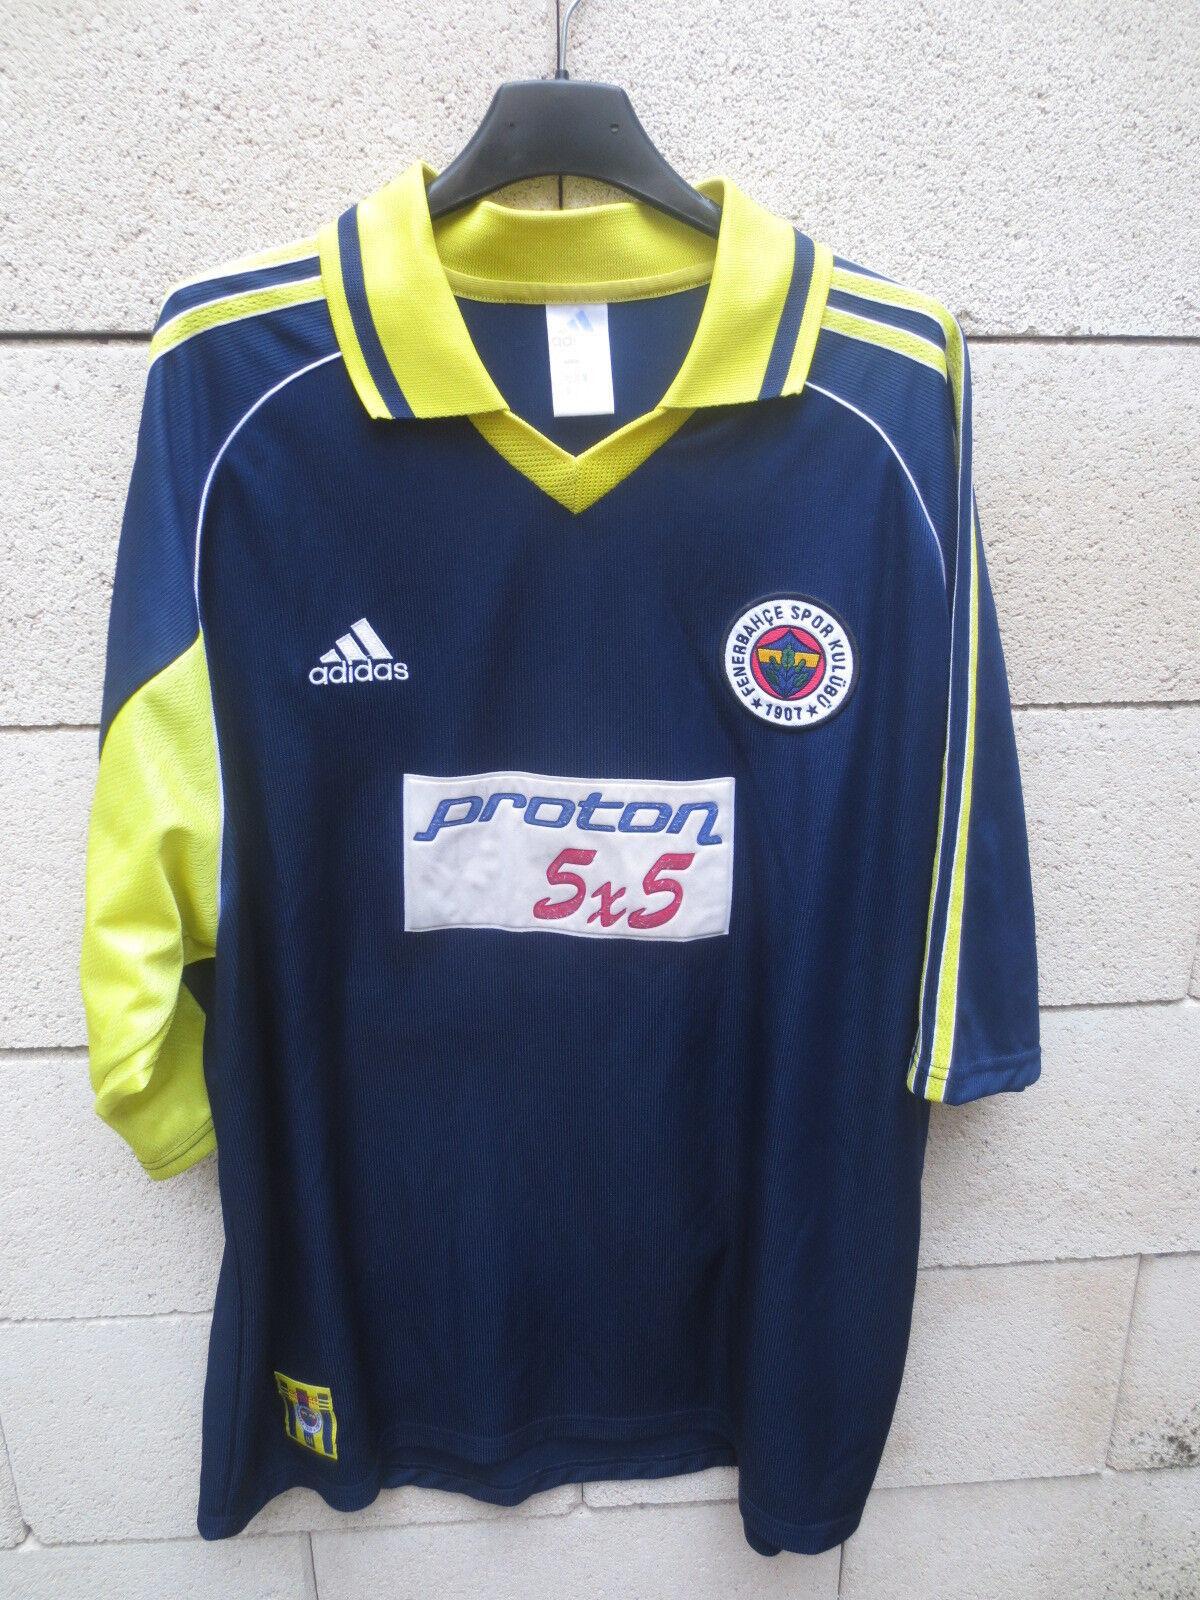 fe4c922b VINTAGE Maillot FENERBAHCE ADIDAS away football shirt trikot XL 2000 ...